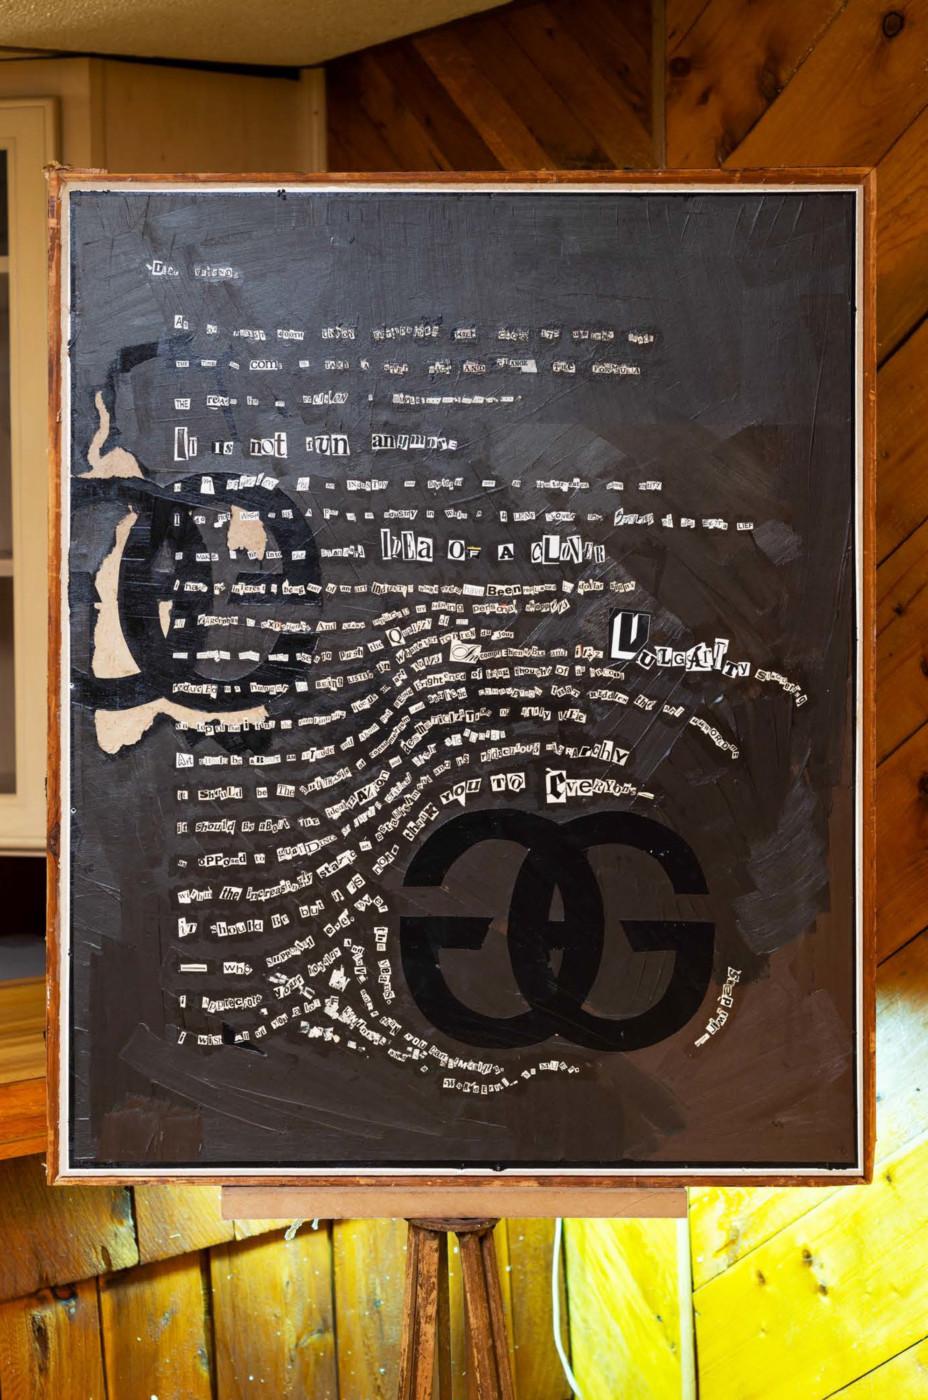 BRADLEY KRONZ  Idea of a Clover , 2019 Mixed media 152,4 × 50,8 × 66,1 cm / 60 x 20 x 26 in - High Art Gallery Paris